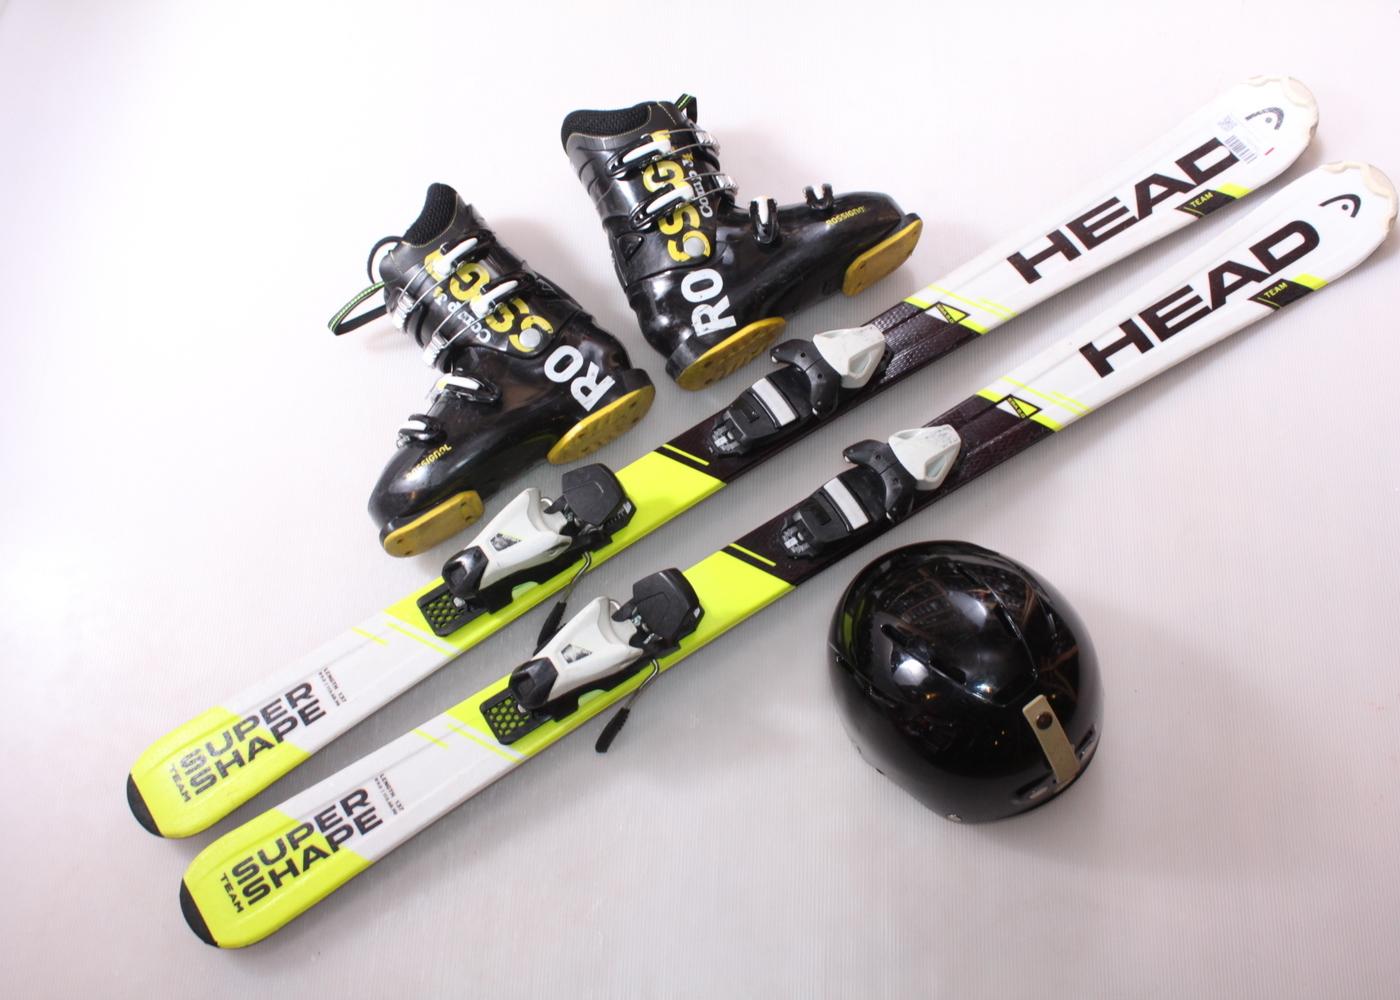 Dětské lyže HEAD SUPERSHAPE TEAM 137 cm + lyžáky  39EU + helma